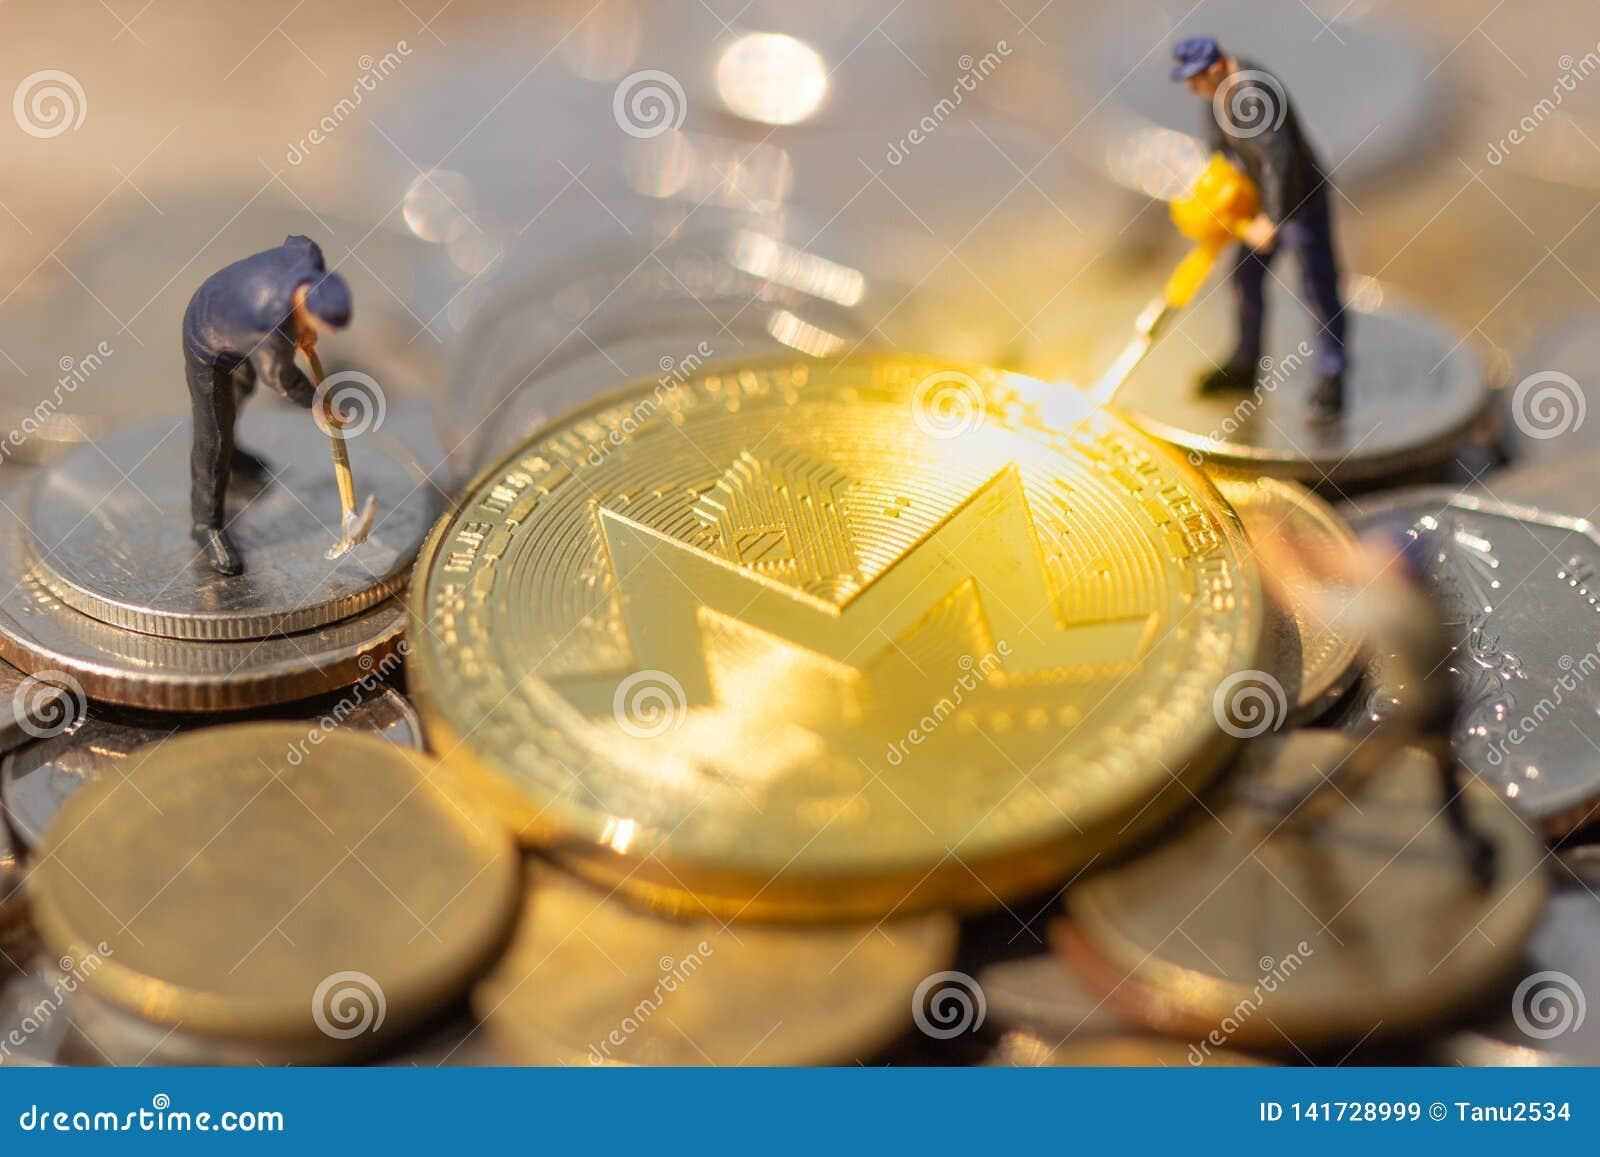 Monero Mining Pool And Mine XMR  Stock Image - Image of bitcoin